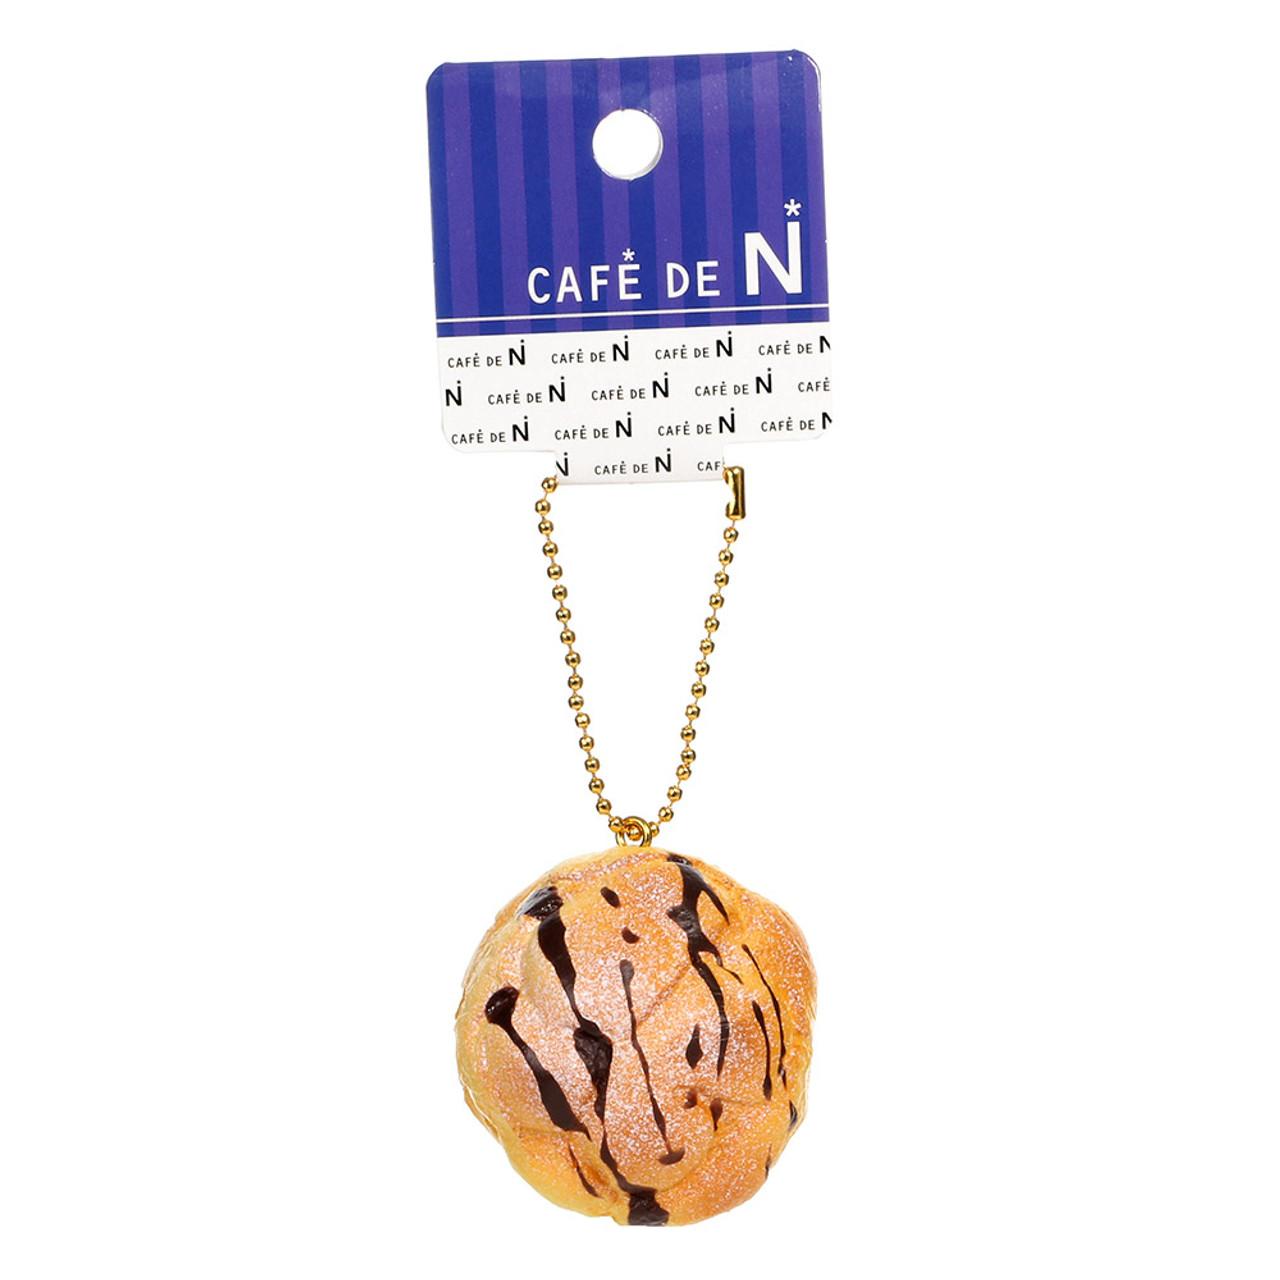 Café De N Chocolate Cream Puff Dessert Squishy Toy Cellphone Charms ( Tag View )